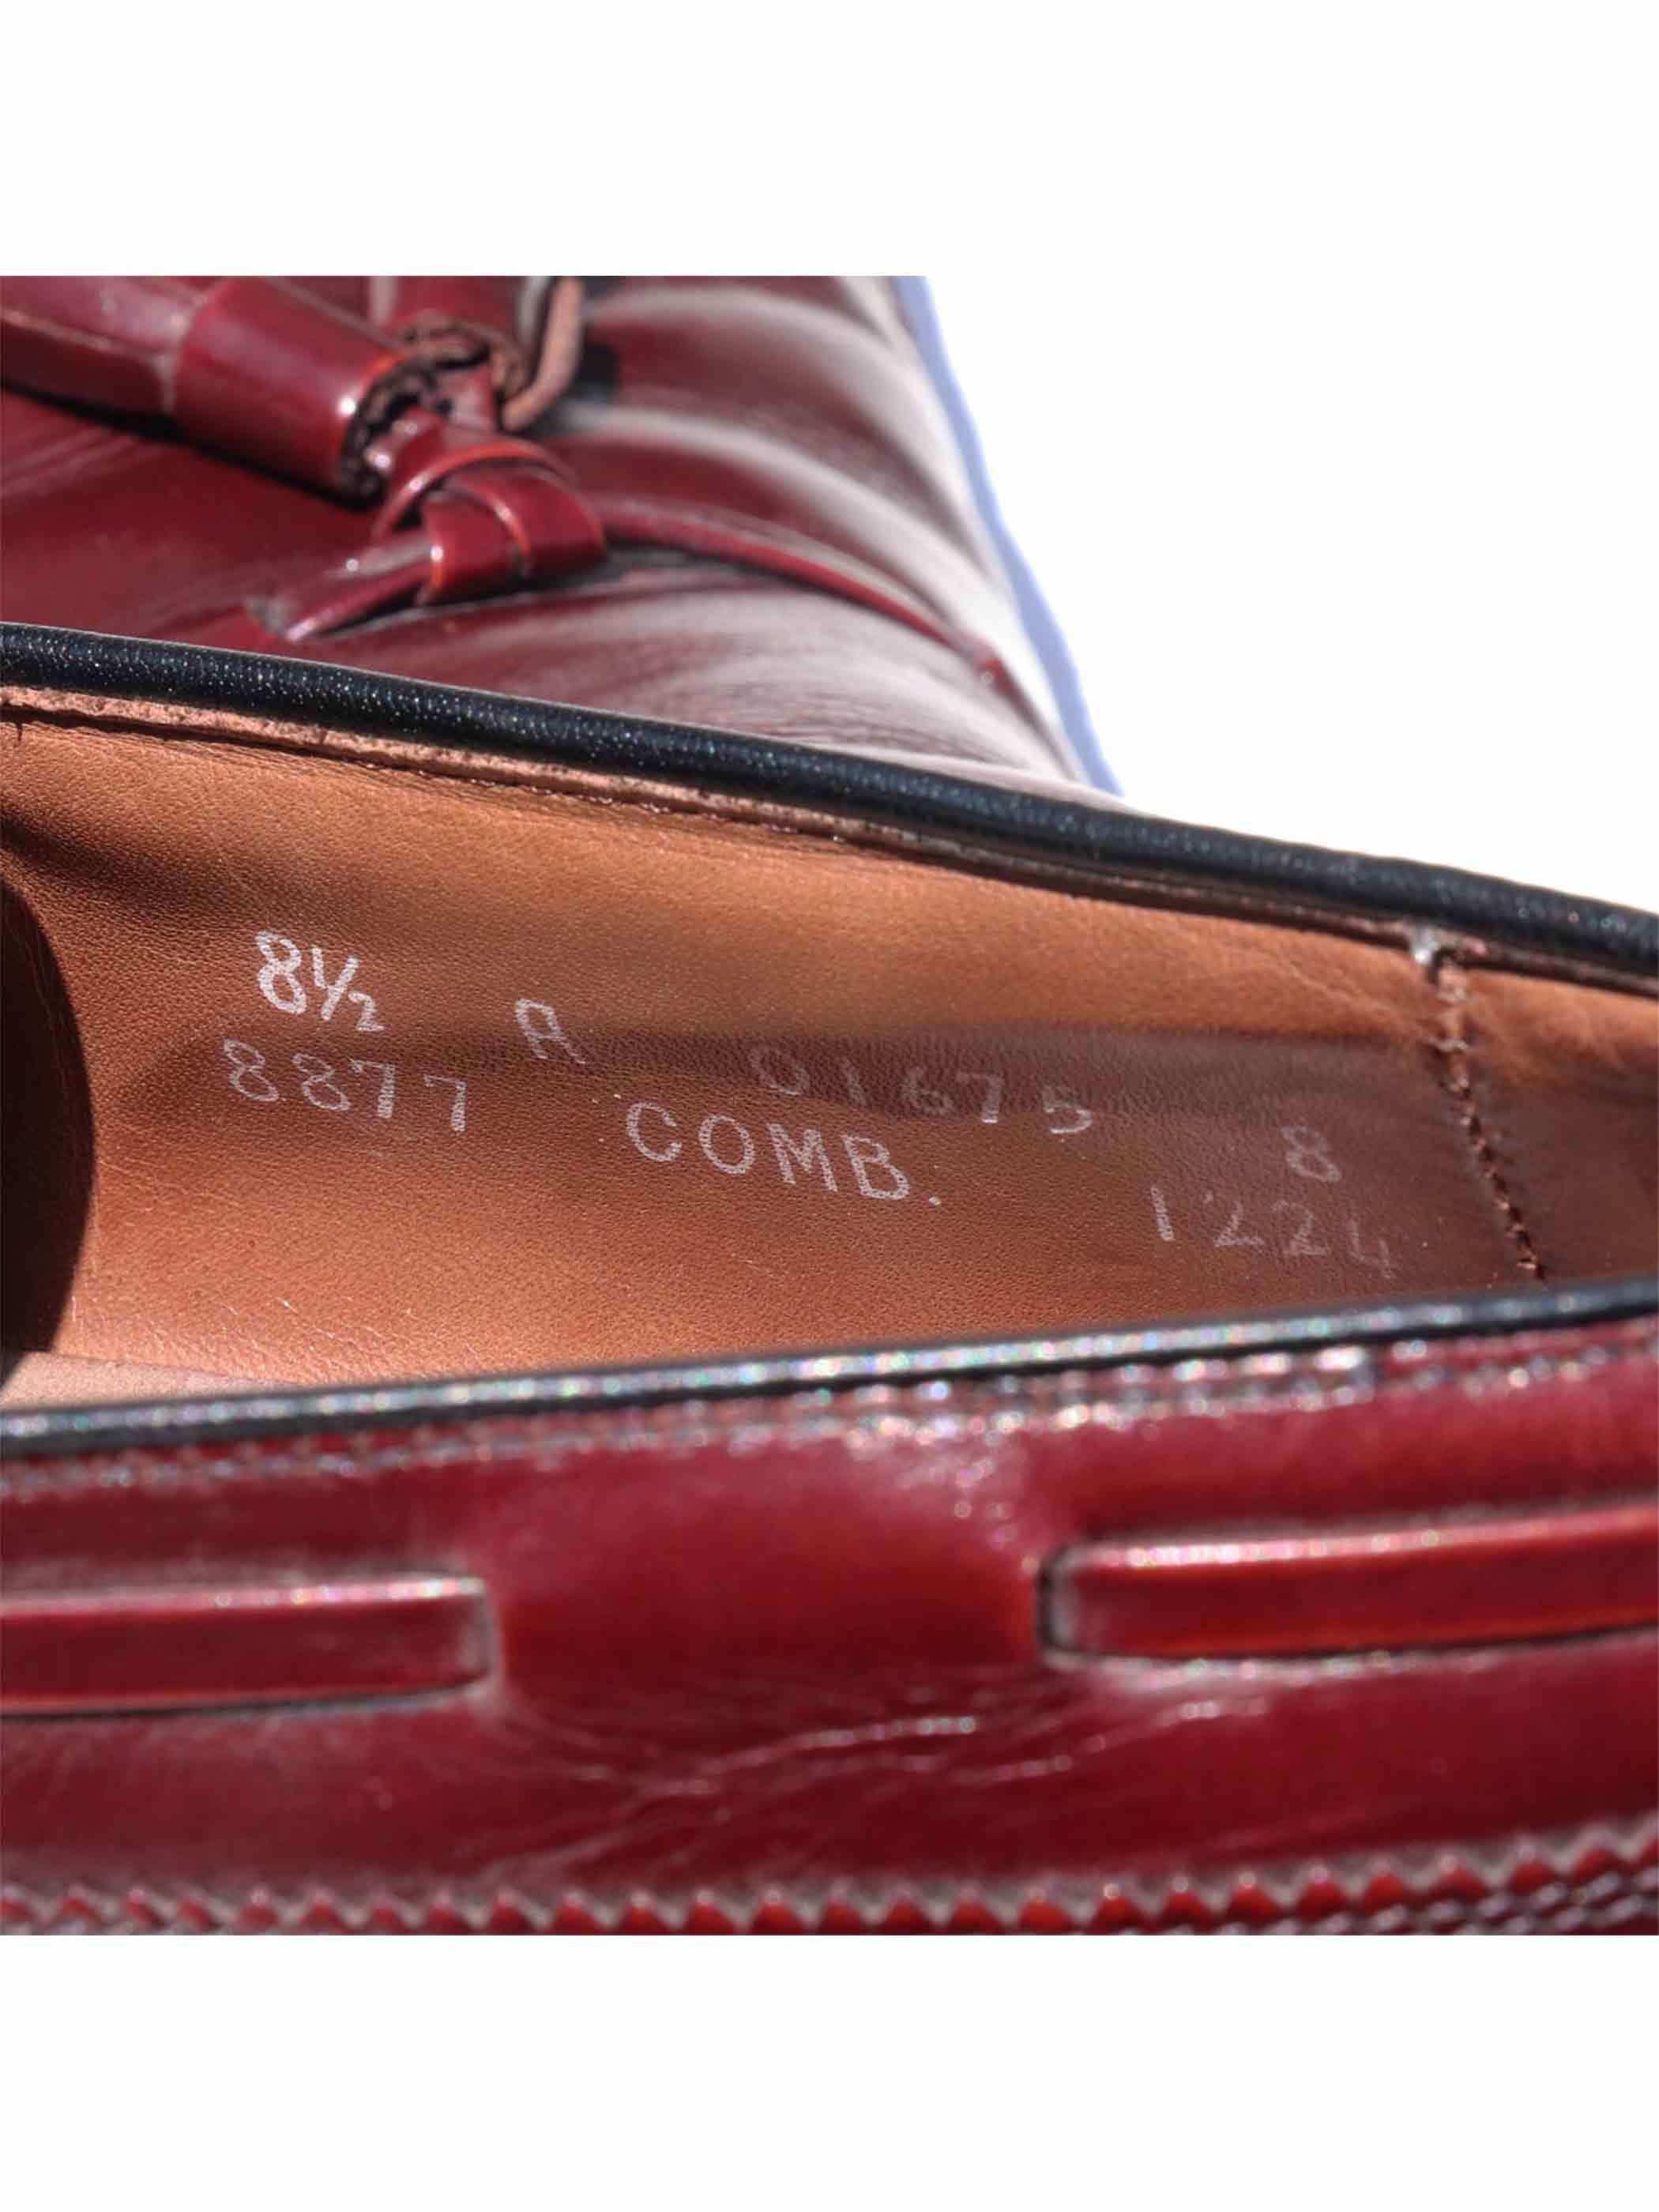 "80's ALLEN EDMONDS ""BERWICK"" USA製 ロングウィングチップ タッセルローファー [8-1/2 A]"